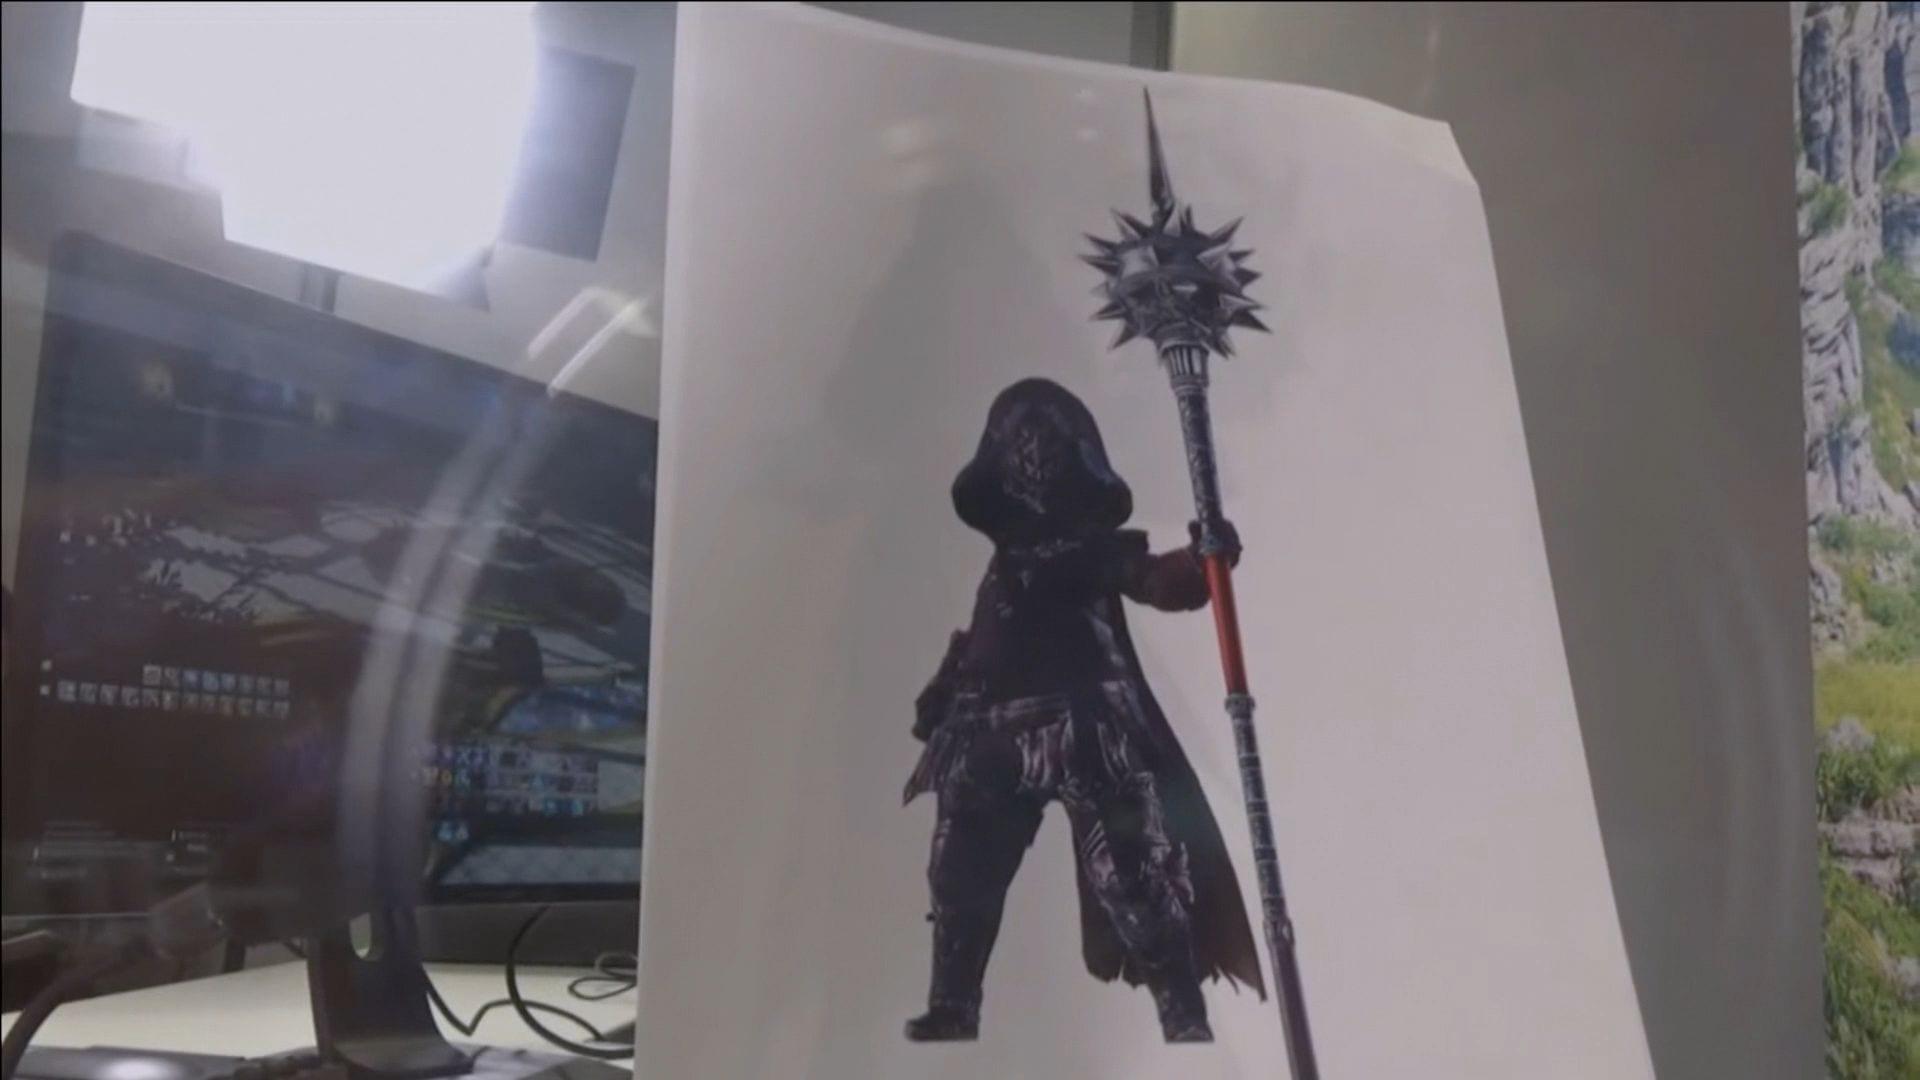 Final-Fantasy-XIV-Screenshot-2020-11-27-13-39-30.jpg